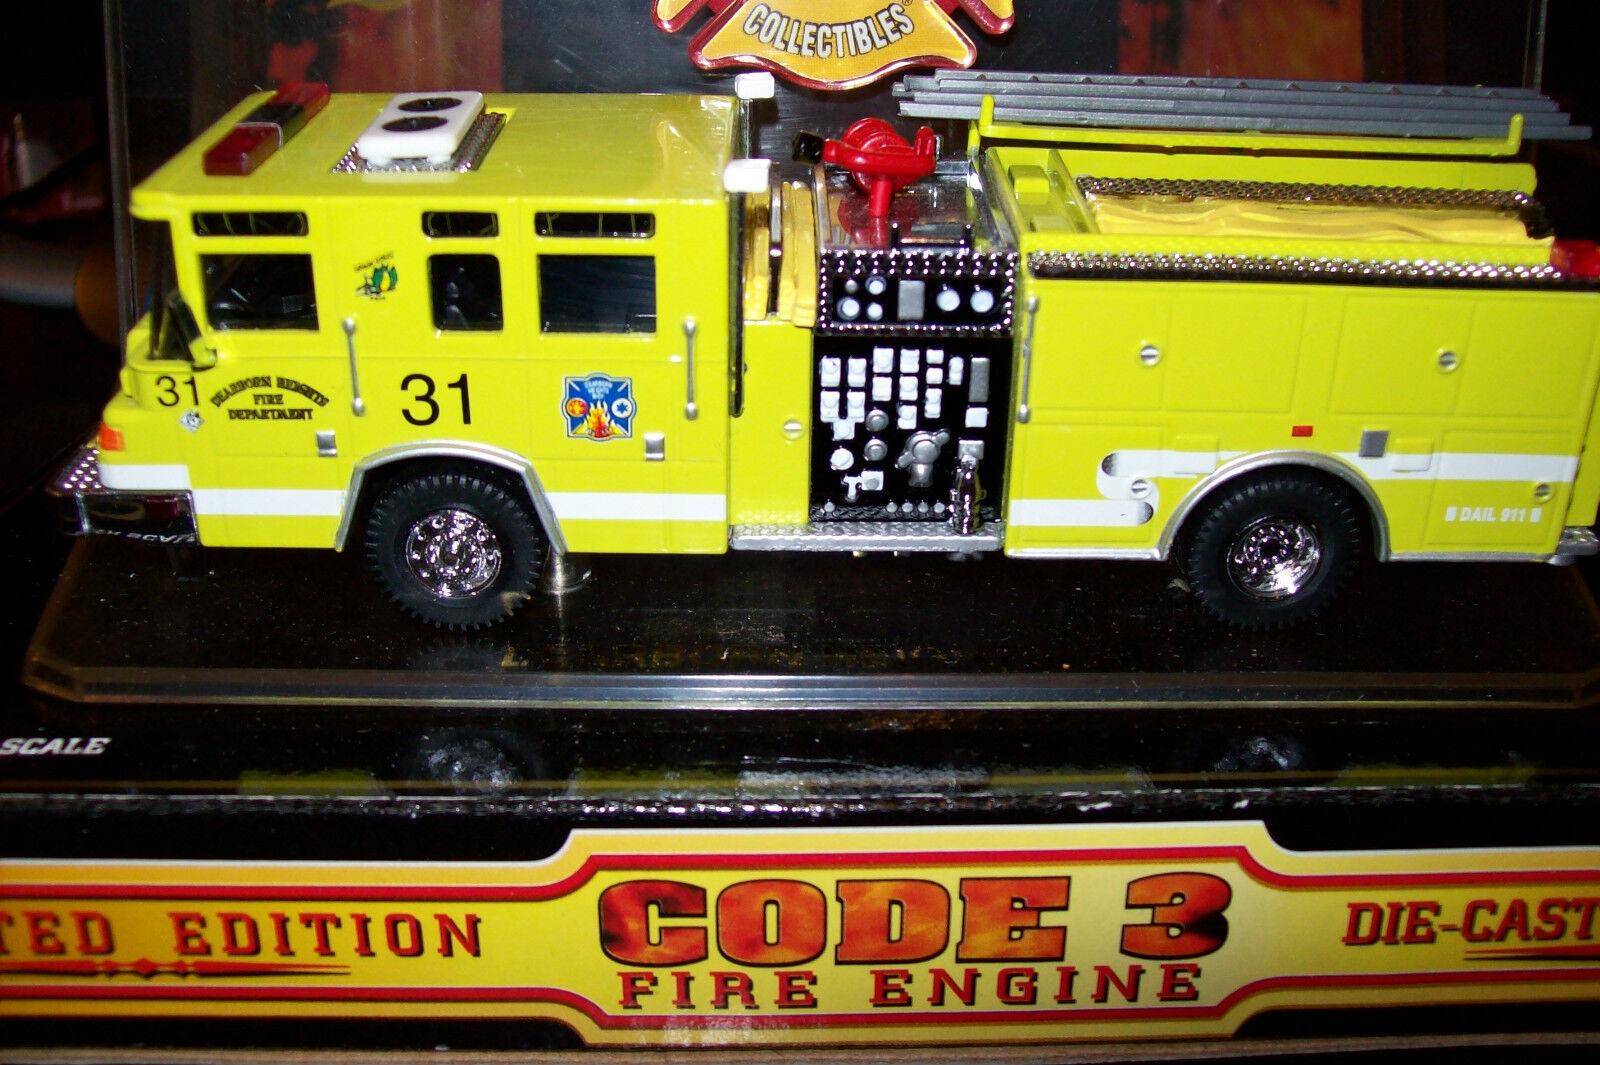 Code 3 - Dearborn Heights  Engine - 31, 31, 31, MI  (fire patch) 0bd366